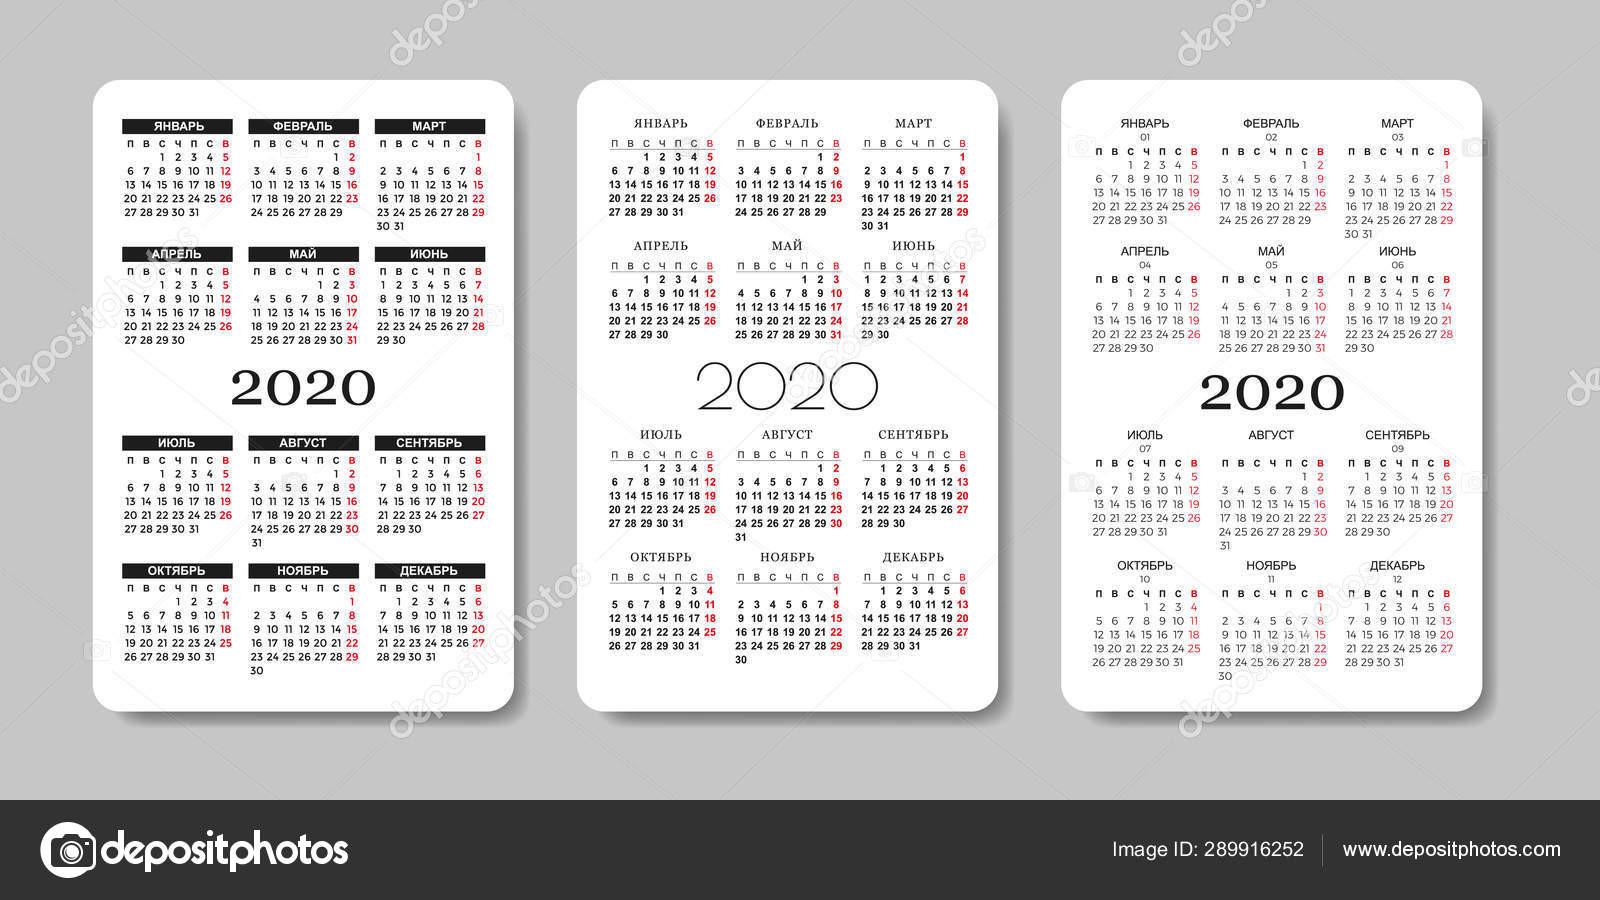 Get Depo Calendar 2020 | Calendar Printables Free Blank  2021 Depo Provera Injection Schedule